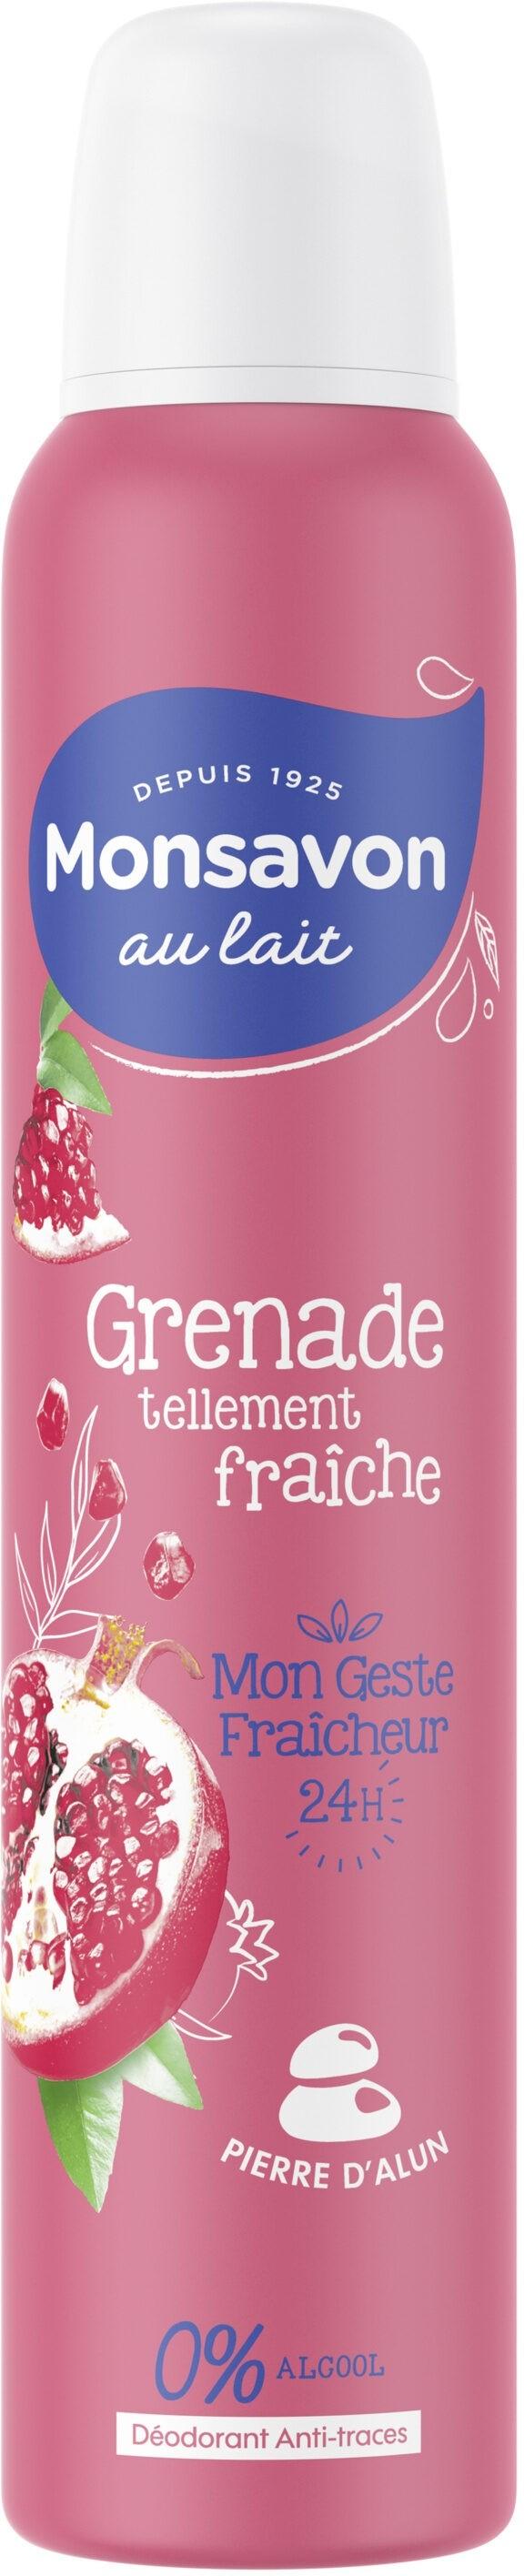 Déodorant Spray Mon savon Grenade 200ml